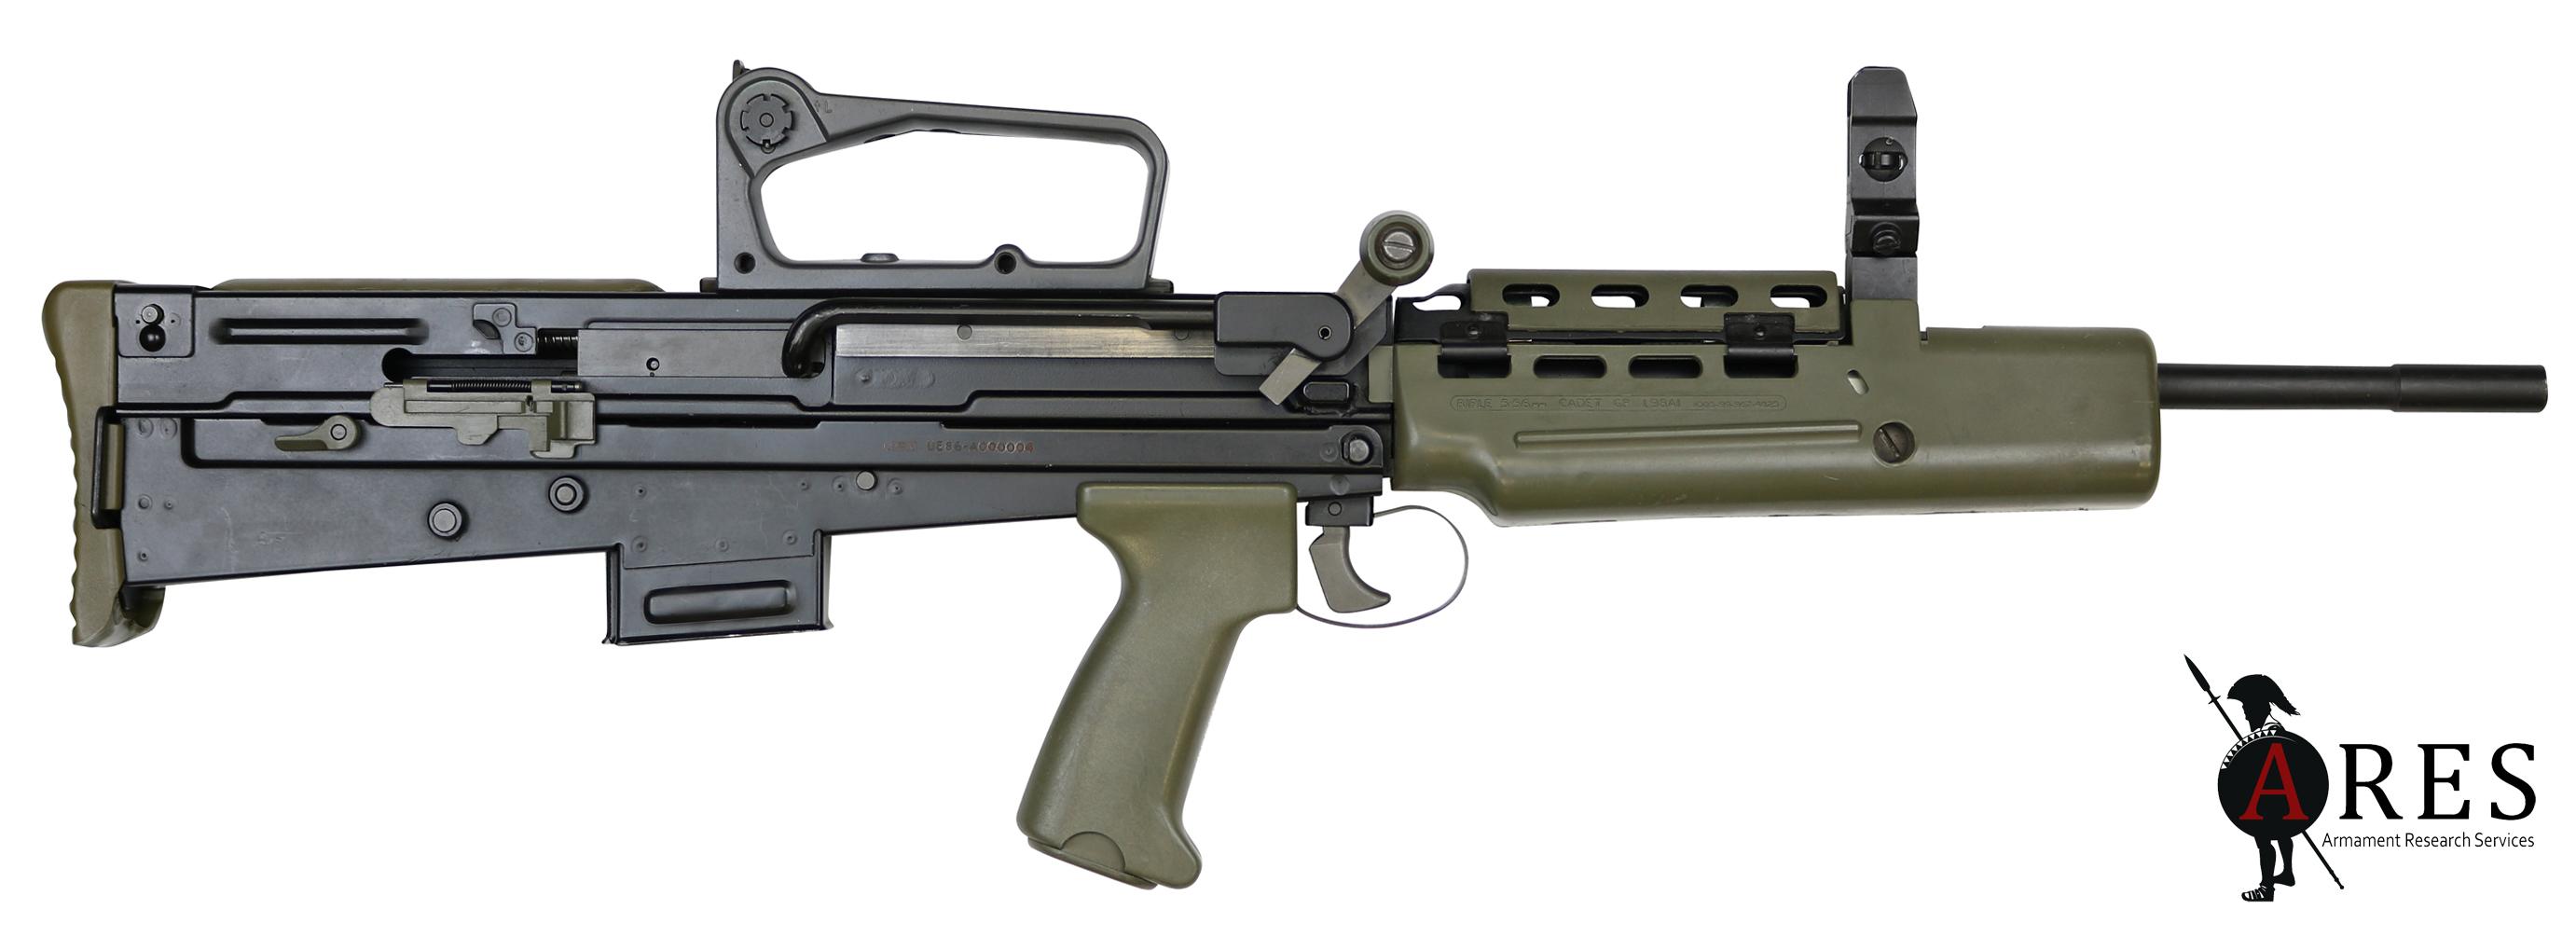 How to Strip a L98 A1 Cadet Gp Rifle